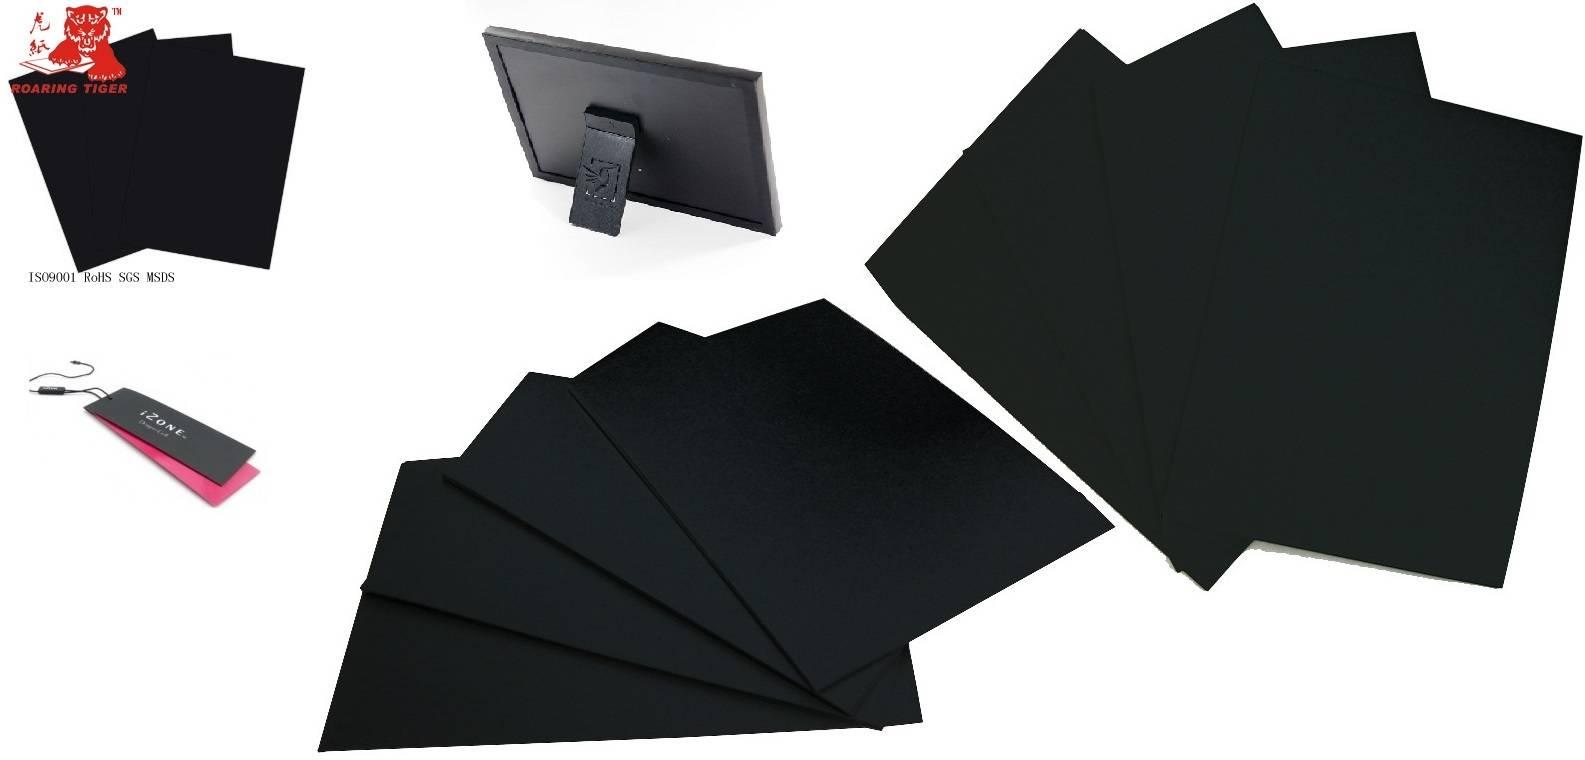 China Black paper/board/laminated cardboard/paperboard 80g 90g 100g 110g 120g 130g 140g 150g 160g 17